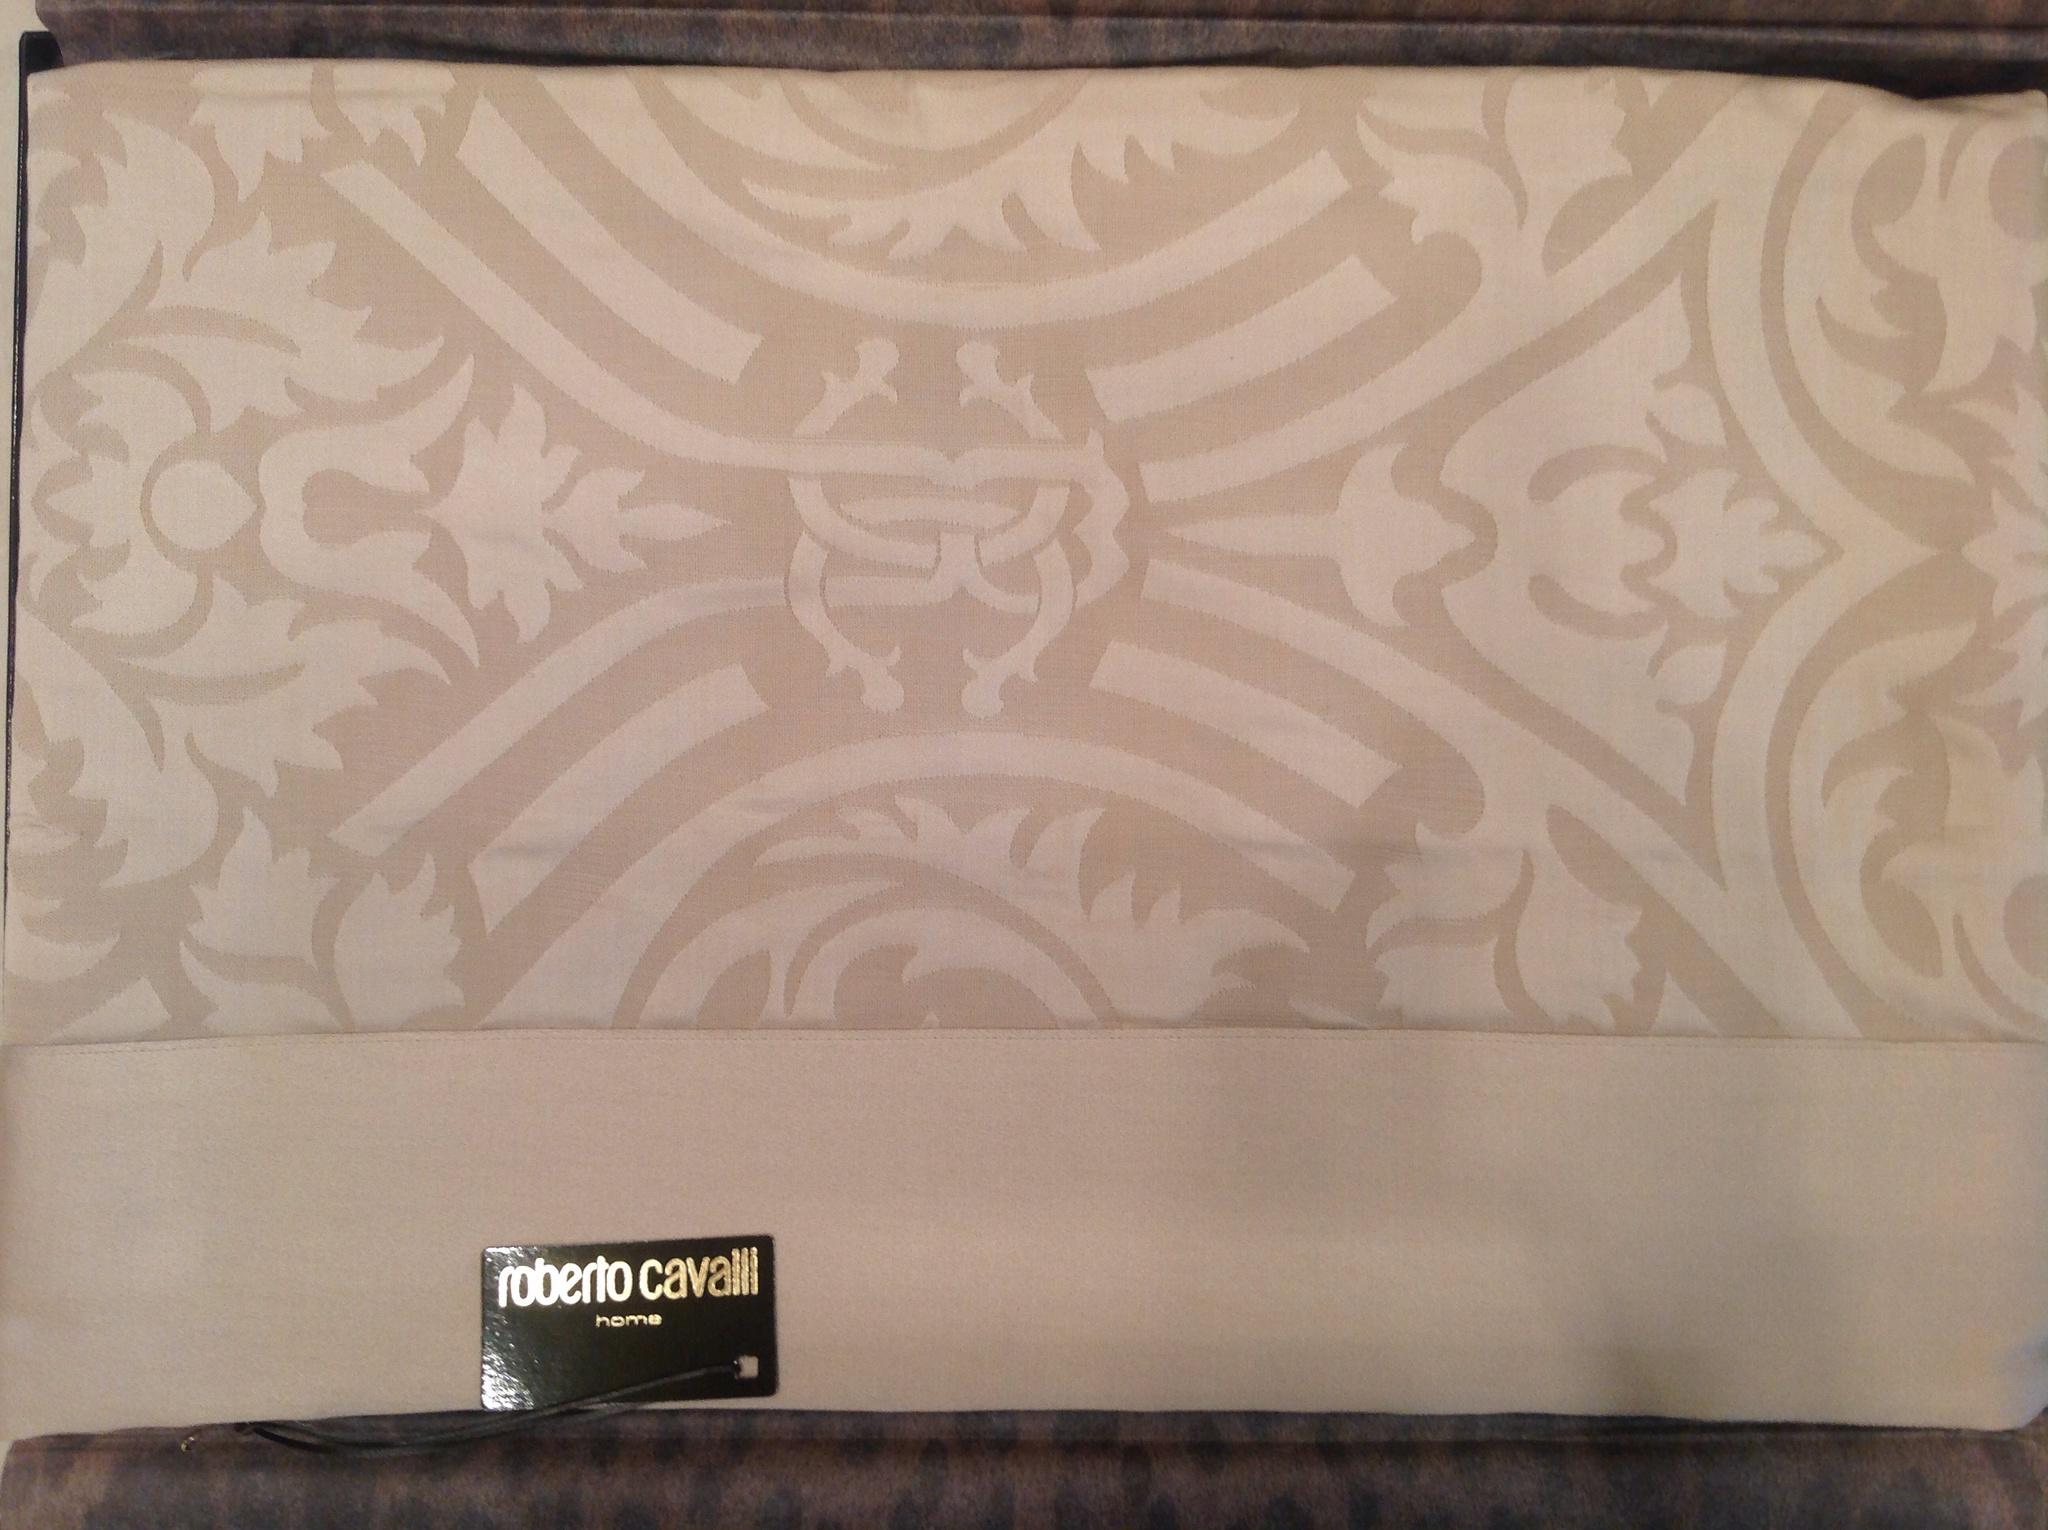 Покрывала Элитное покрывало Damasco v886 saio от Roberto Cavalli image.jpg